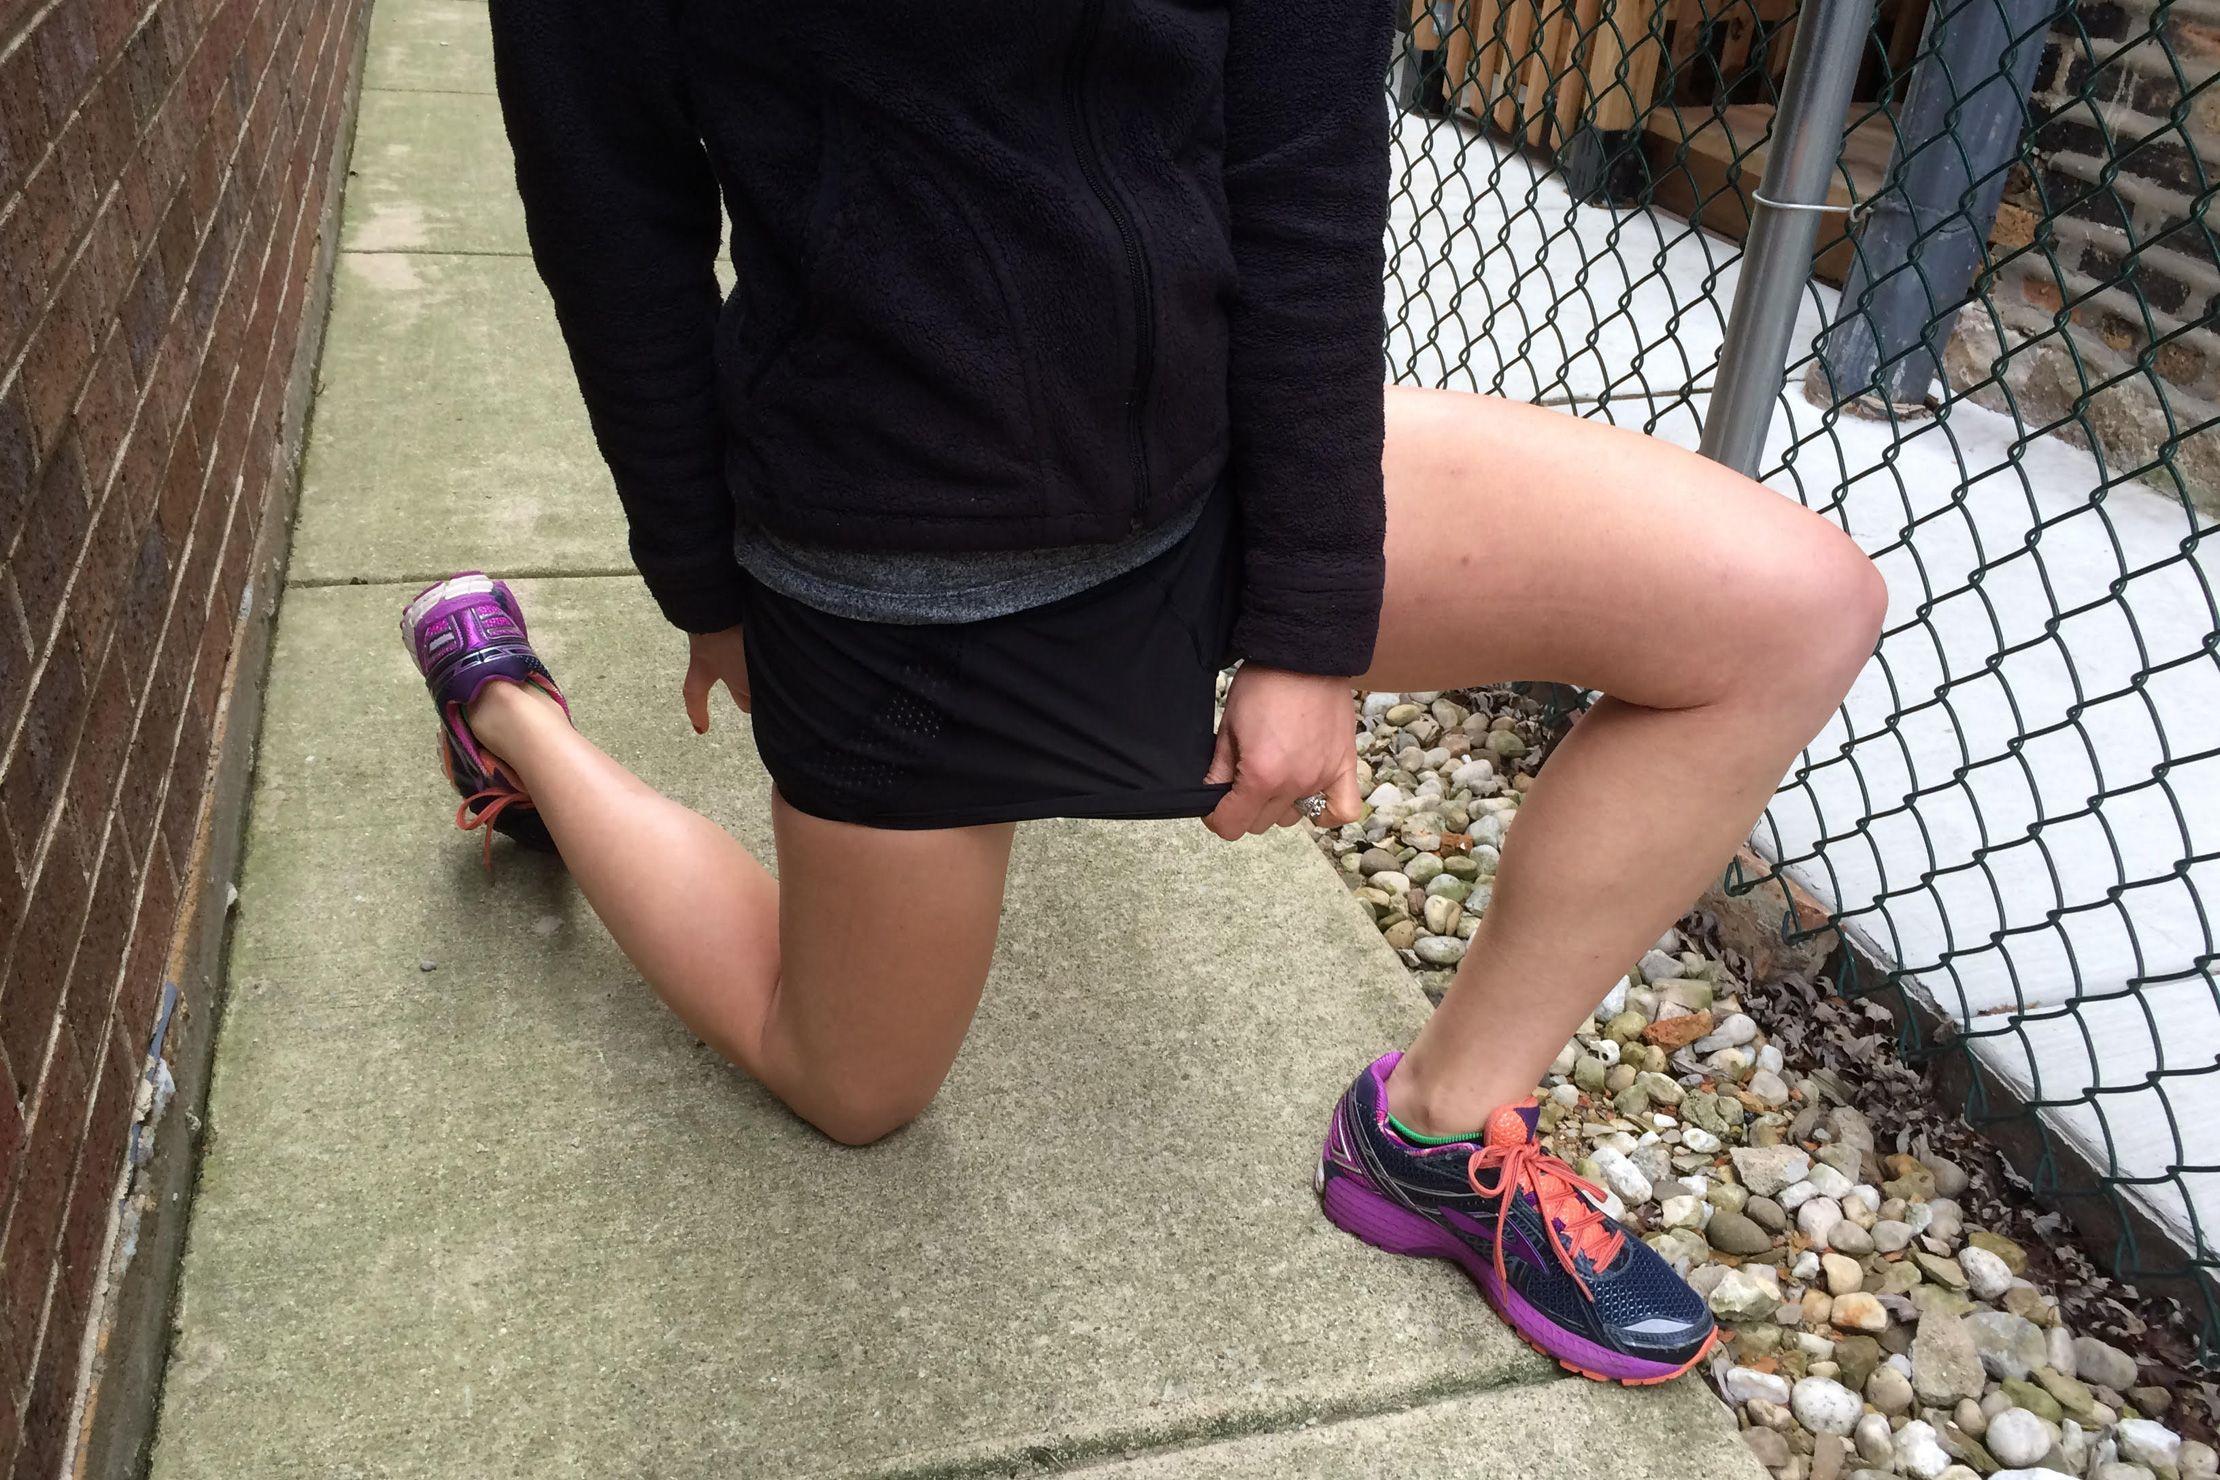 Skinny teens fucking stockings